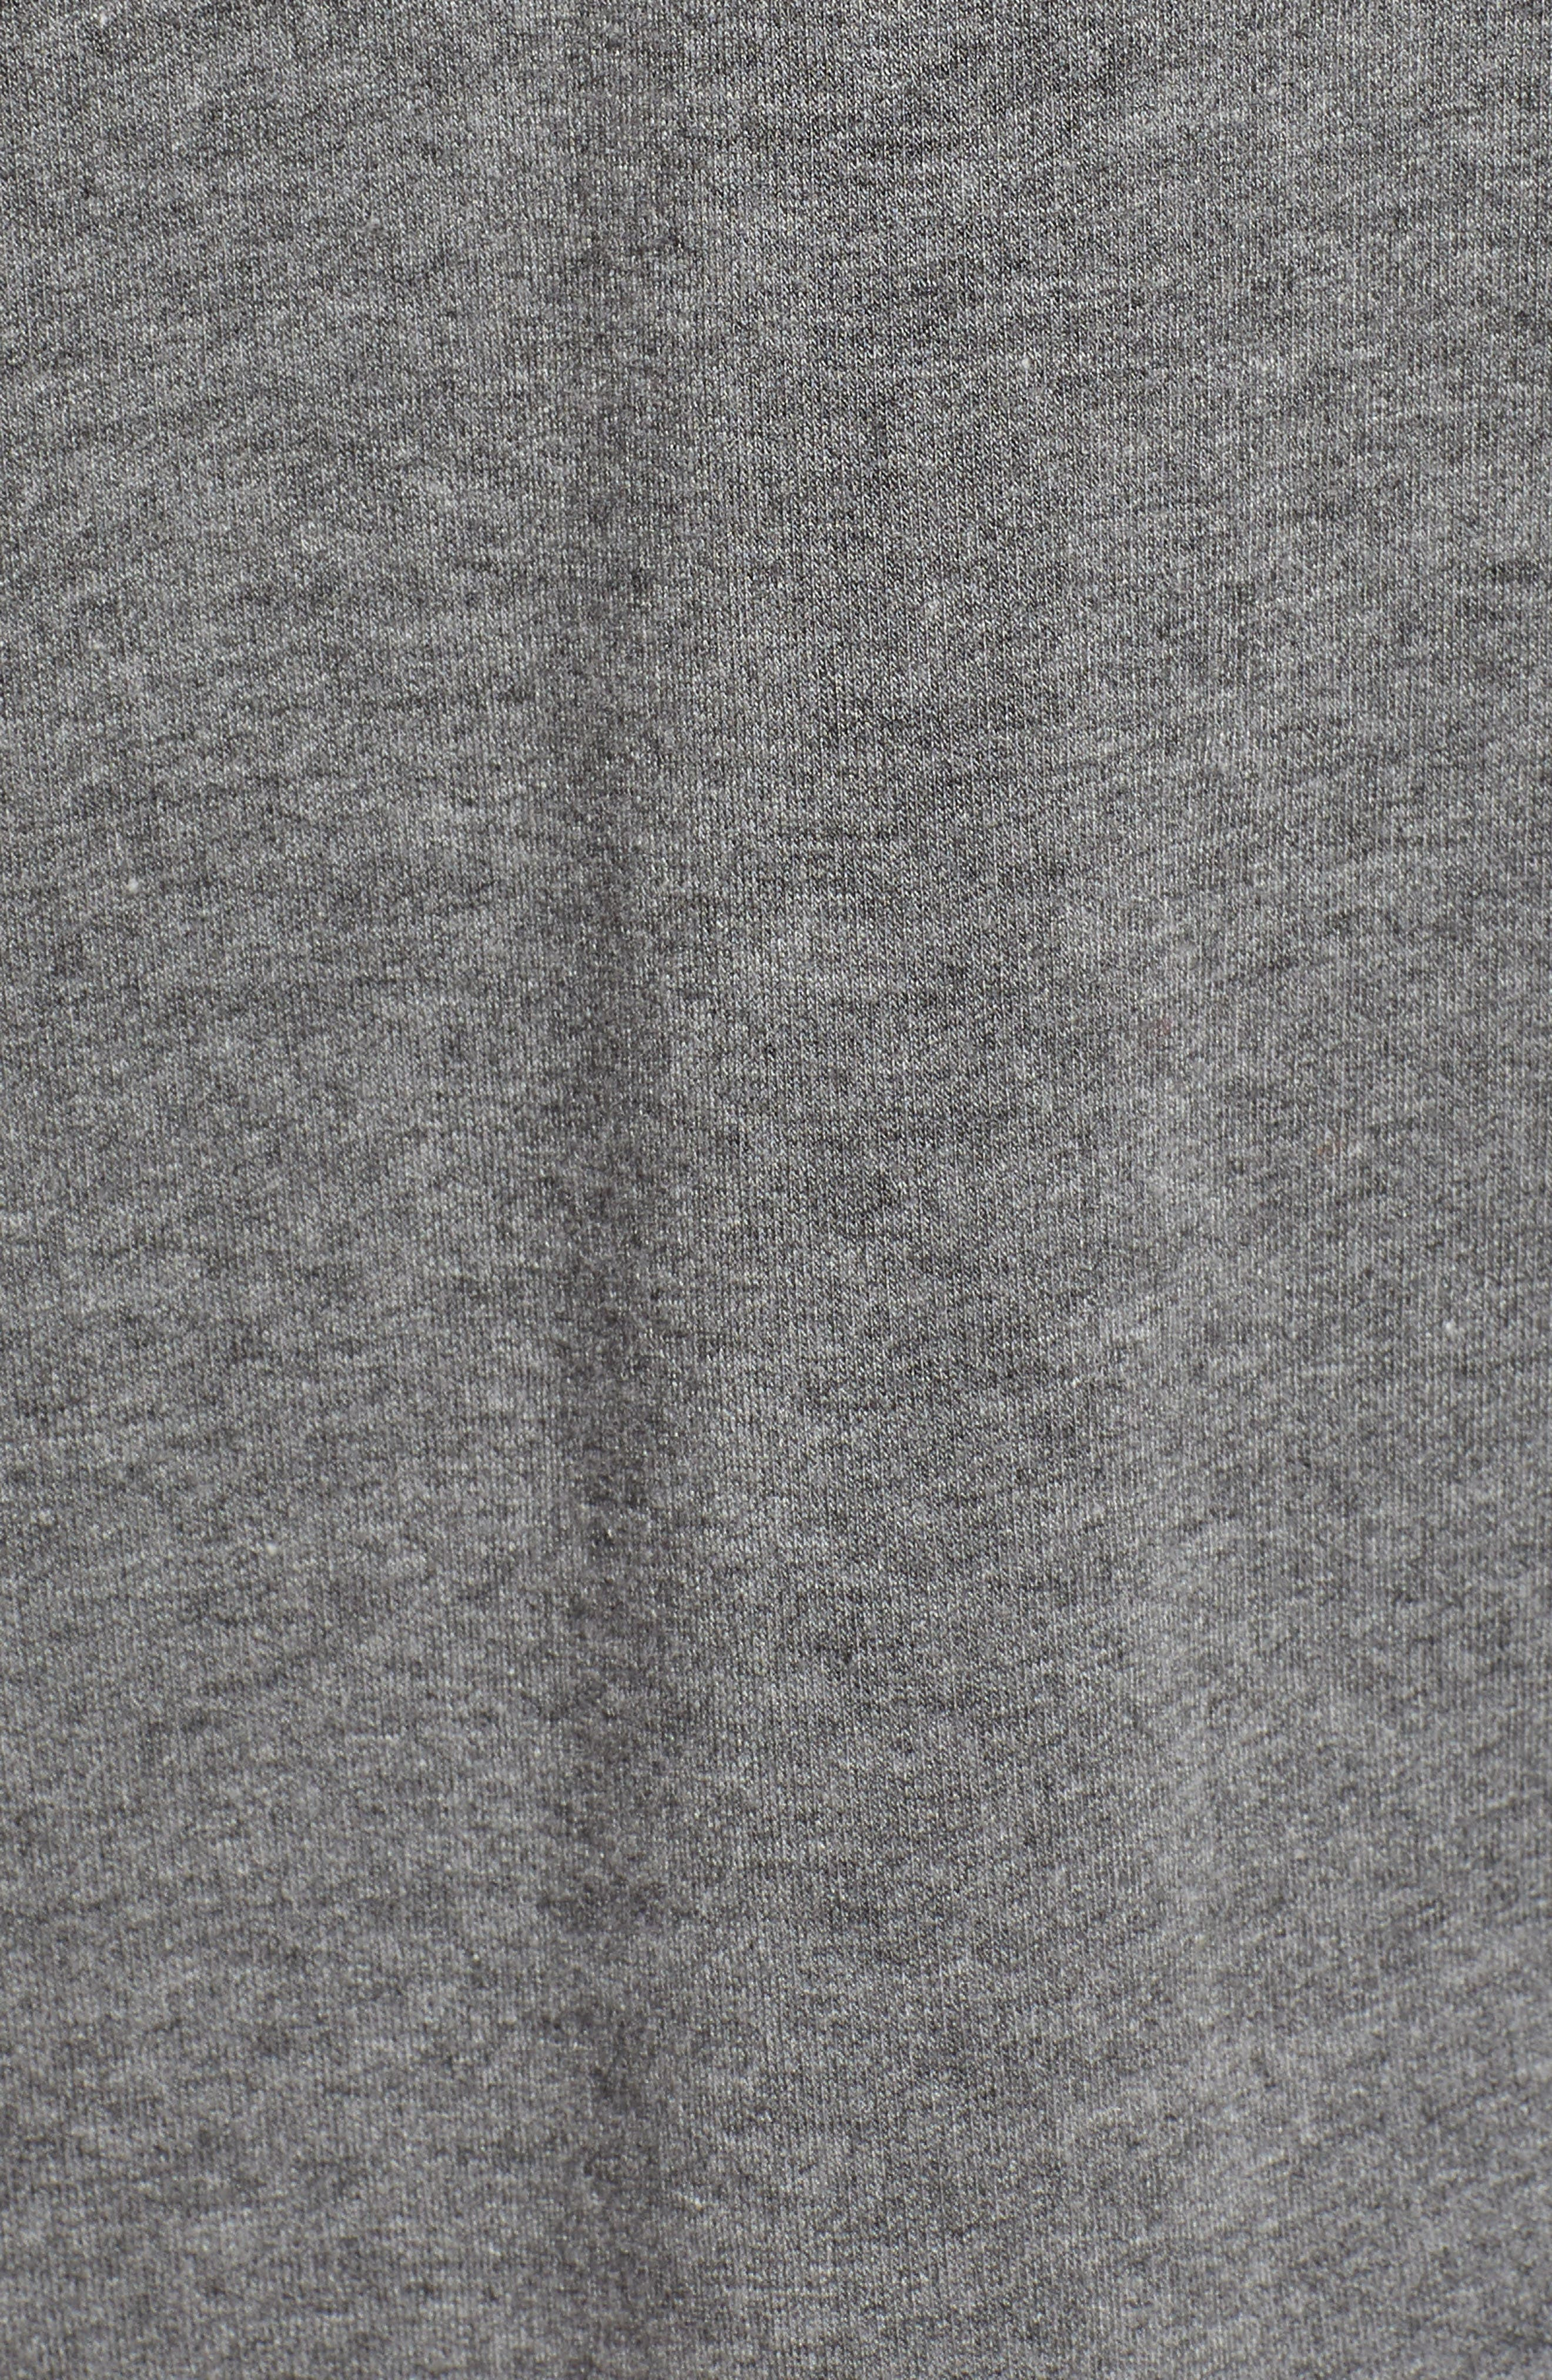 Athleisure Stripe Detail Sweatshirt,                             Alternate thumbnail 5, color,                             024